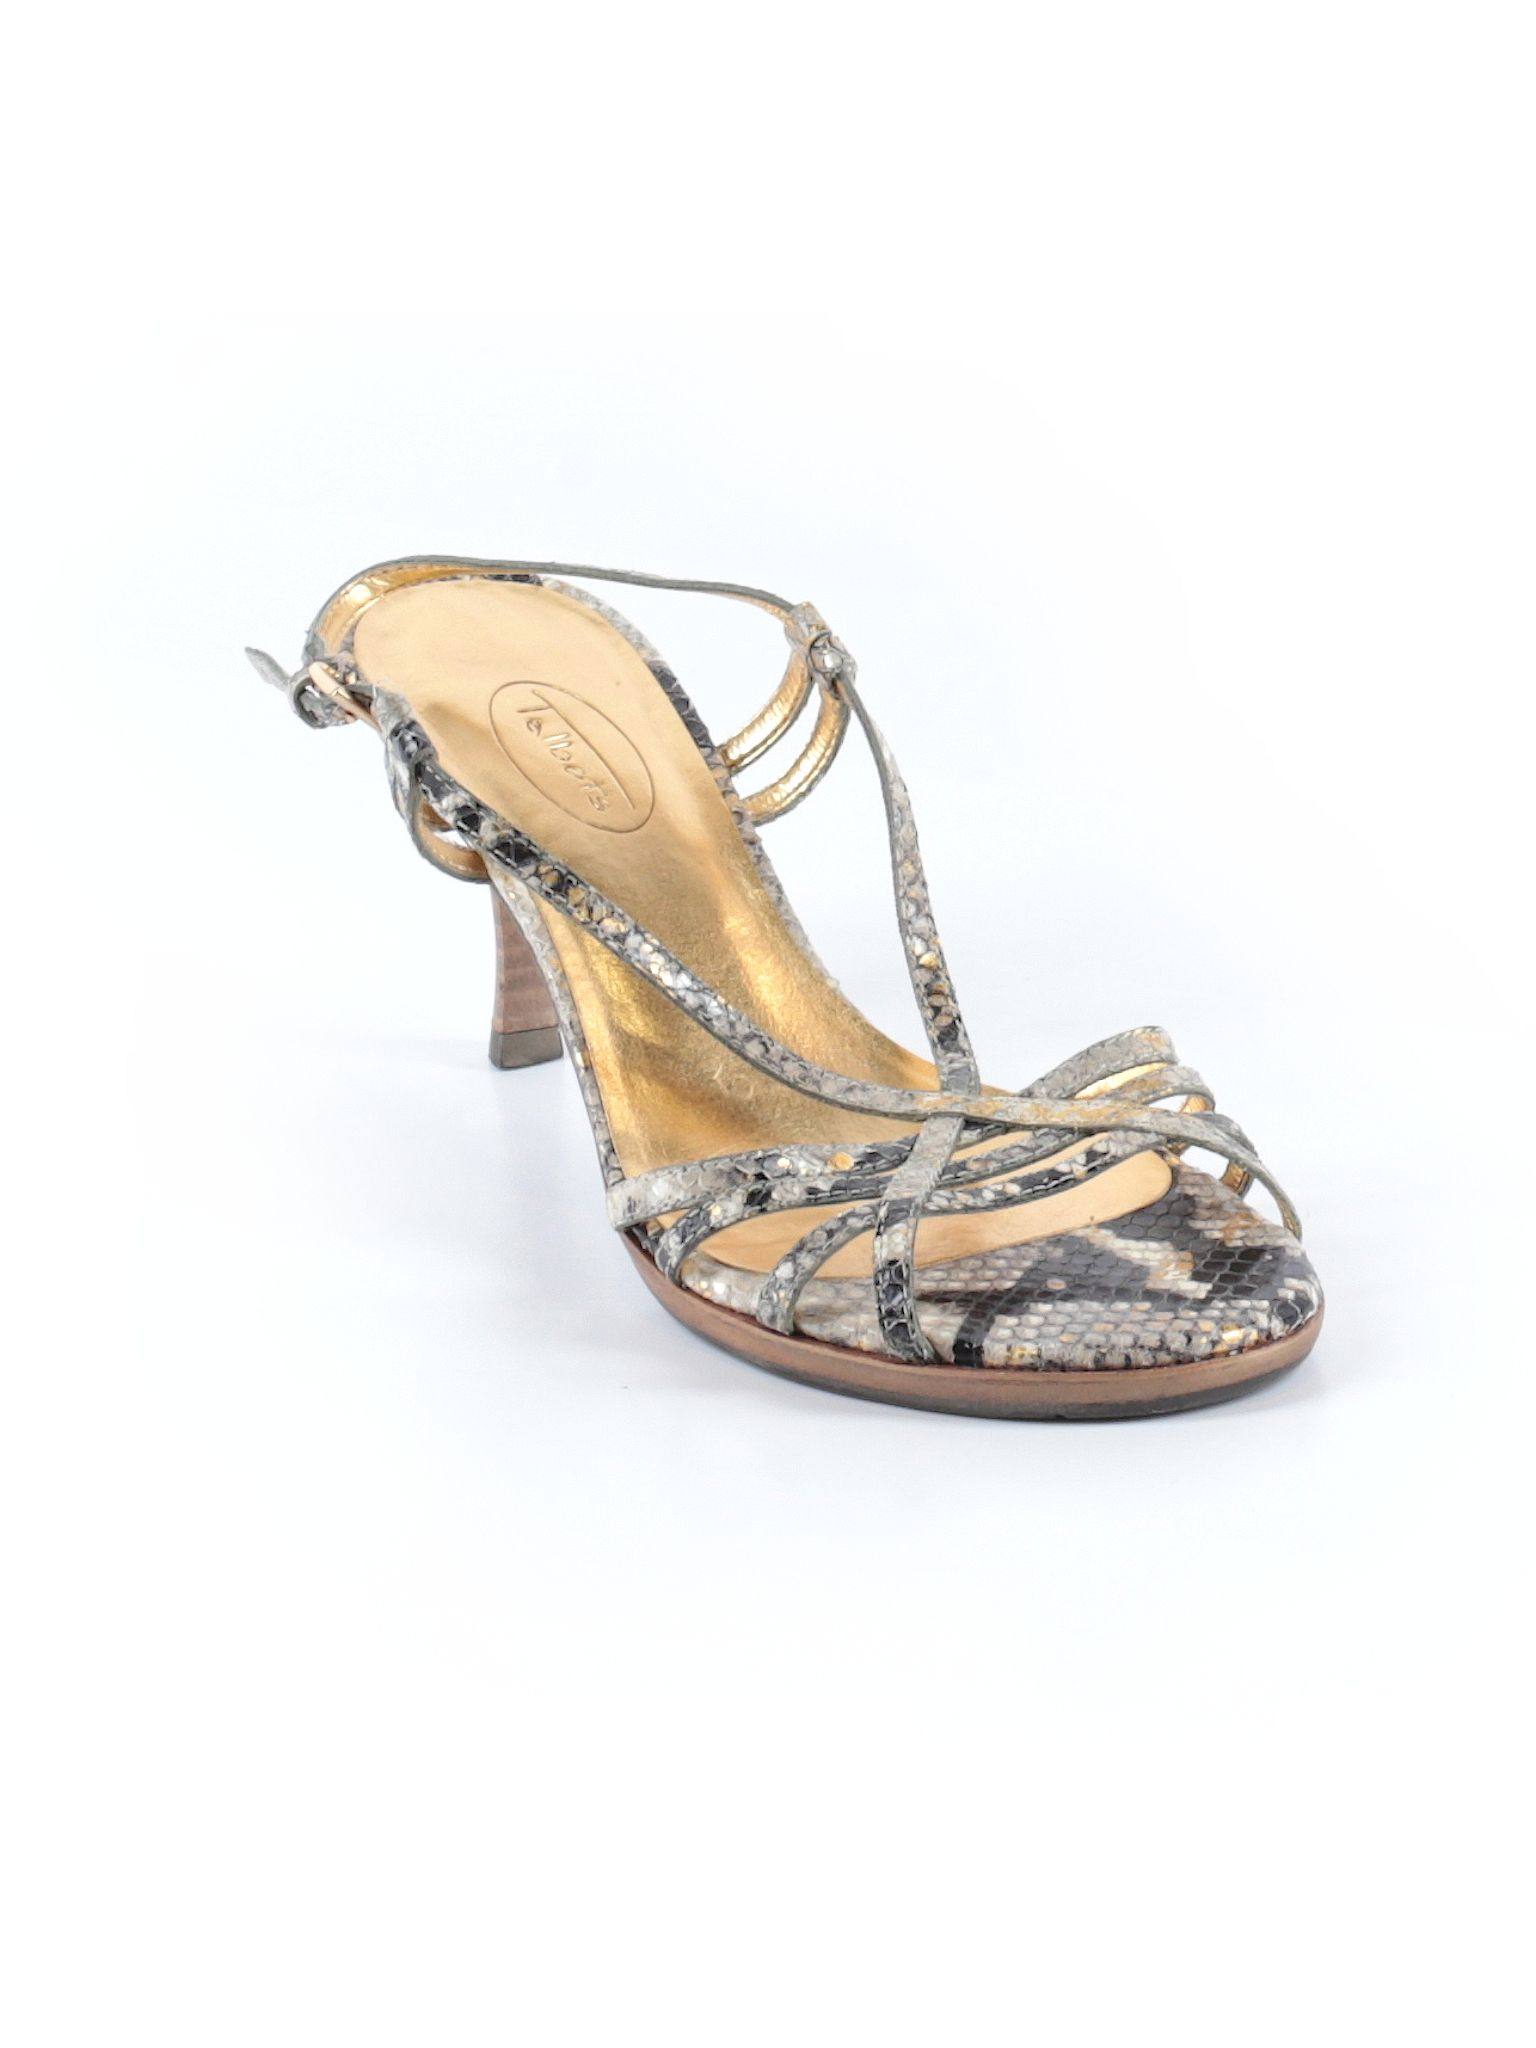 71efd92704f Talbots Heels  Gold Women s Clothing - 25286811